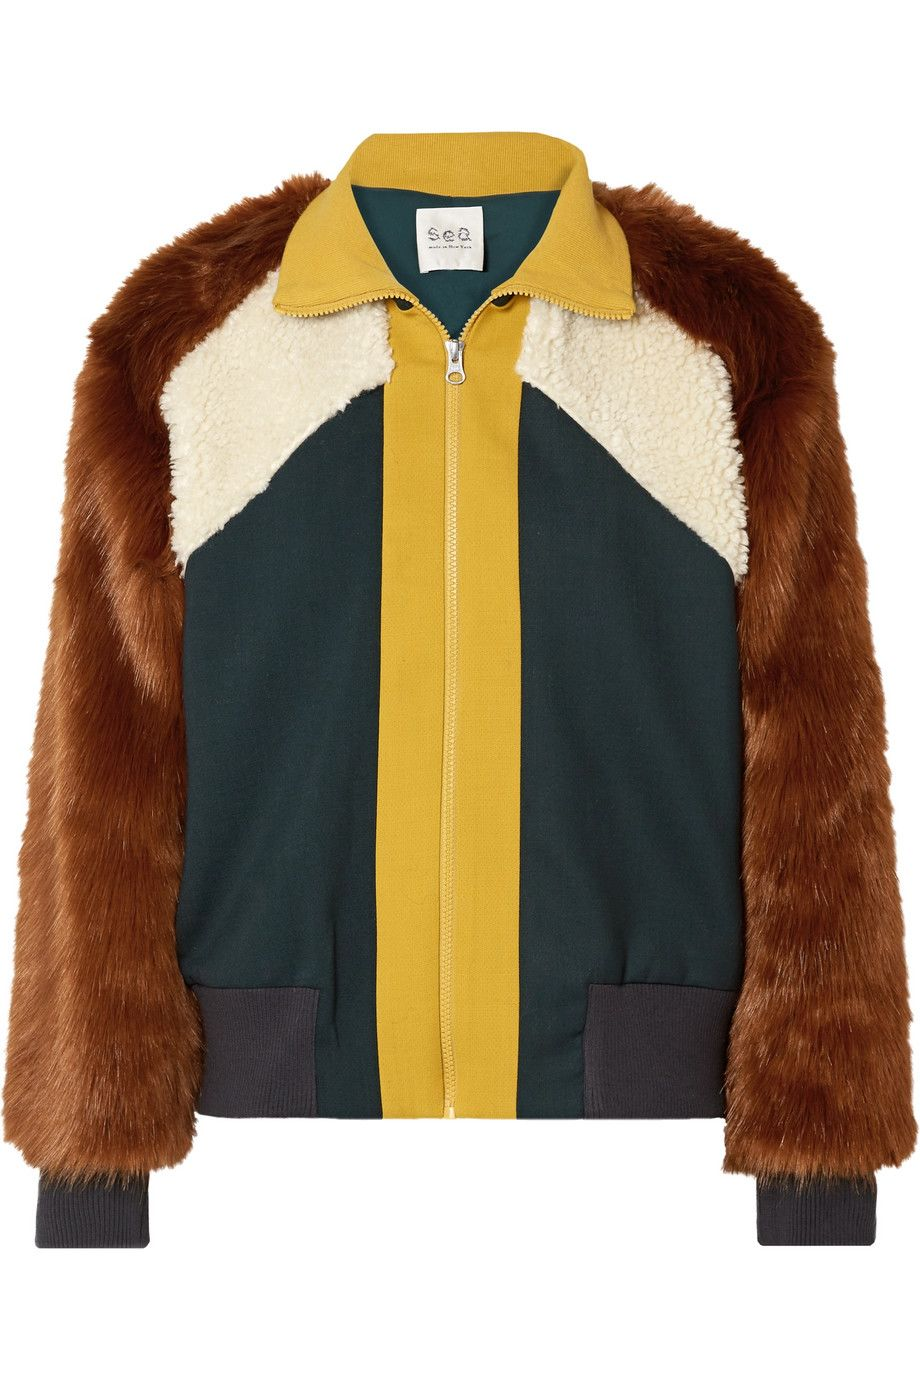 #PopbelaOOTD: Yang Mana Statement Jacket Pilihanmu?